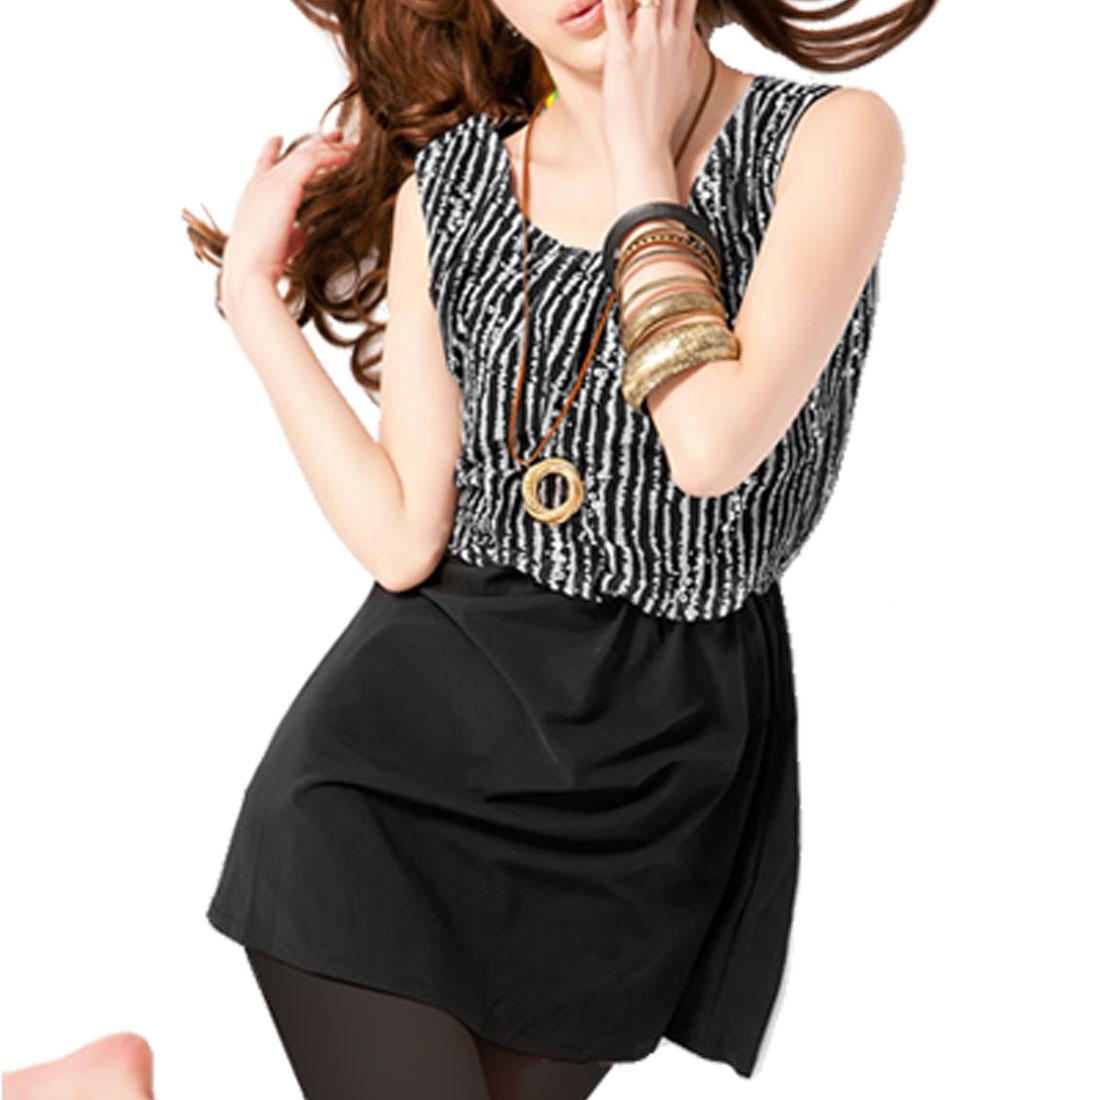 Women Seqiun Decor White Striped Elastic Waist Black Tank Top XS